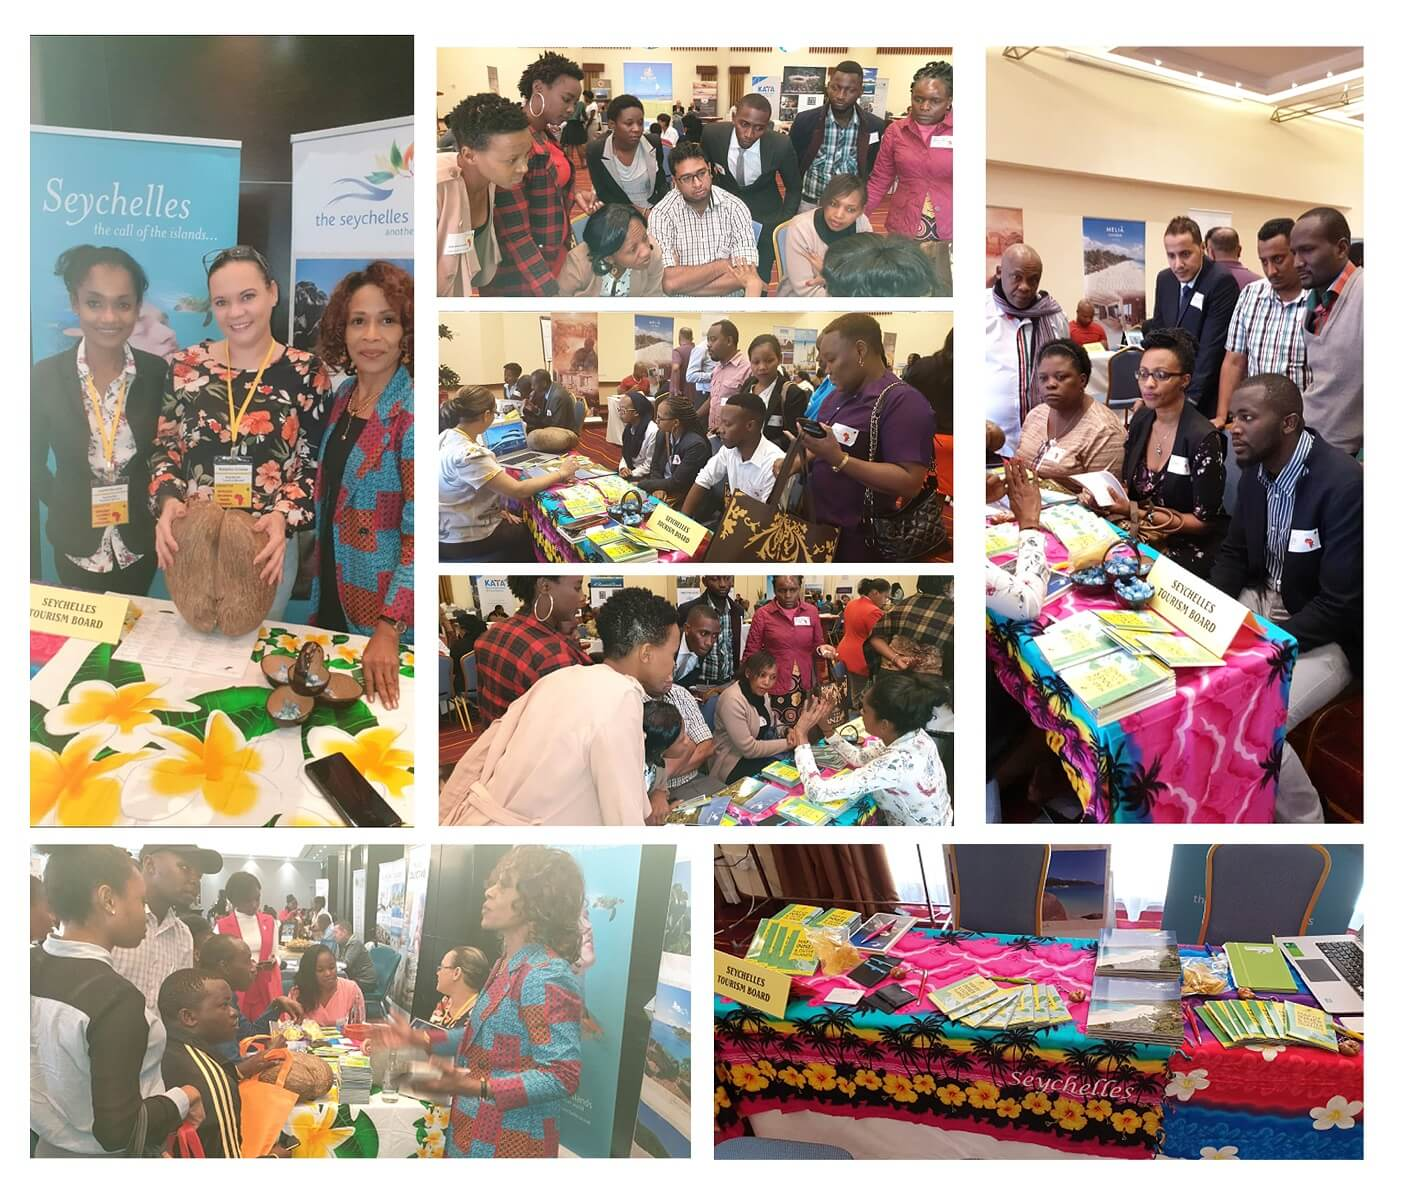 Destination Seychelles radiates at the Spotlight on Africa workshop in Nairobi